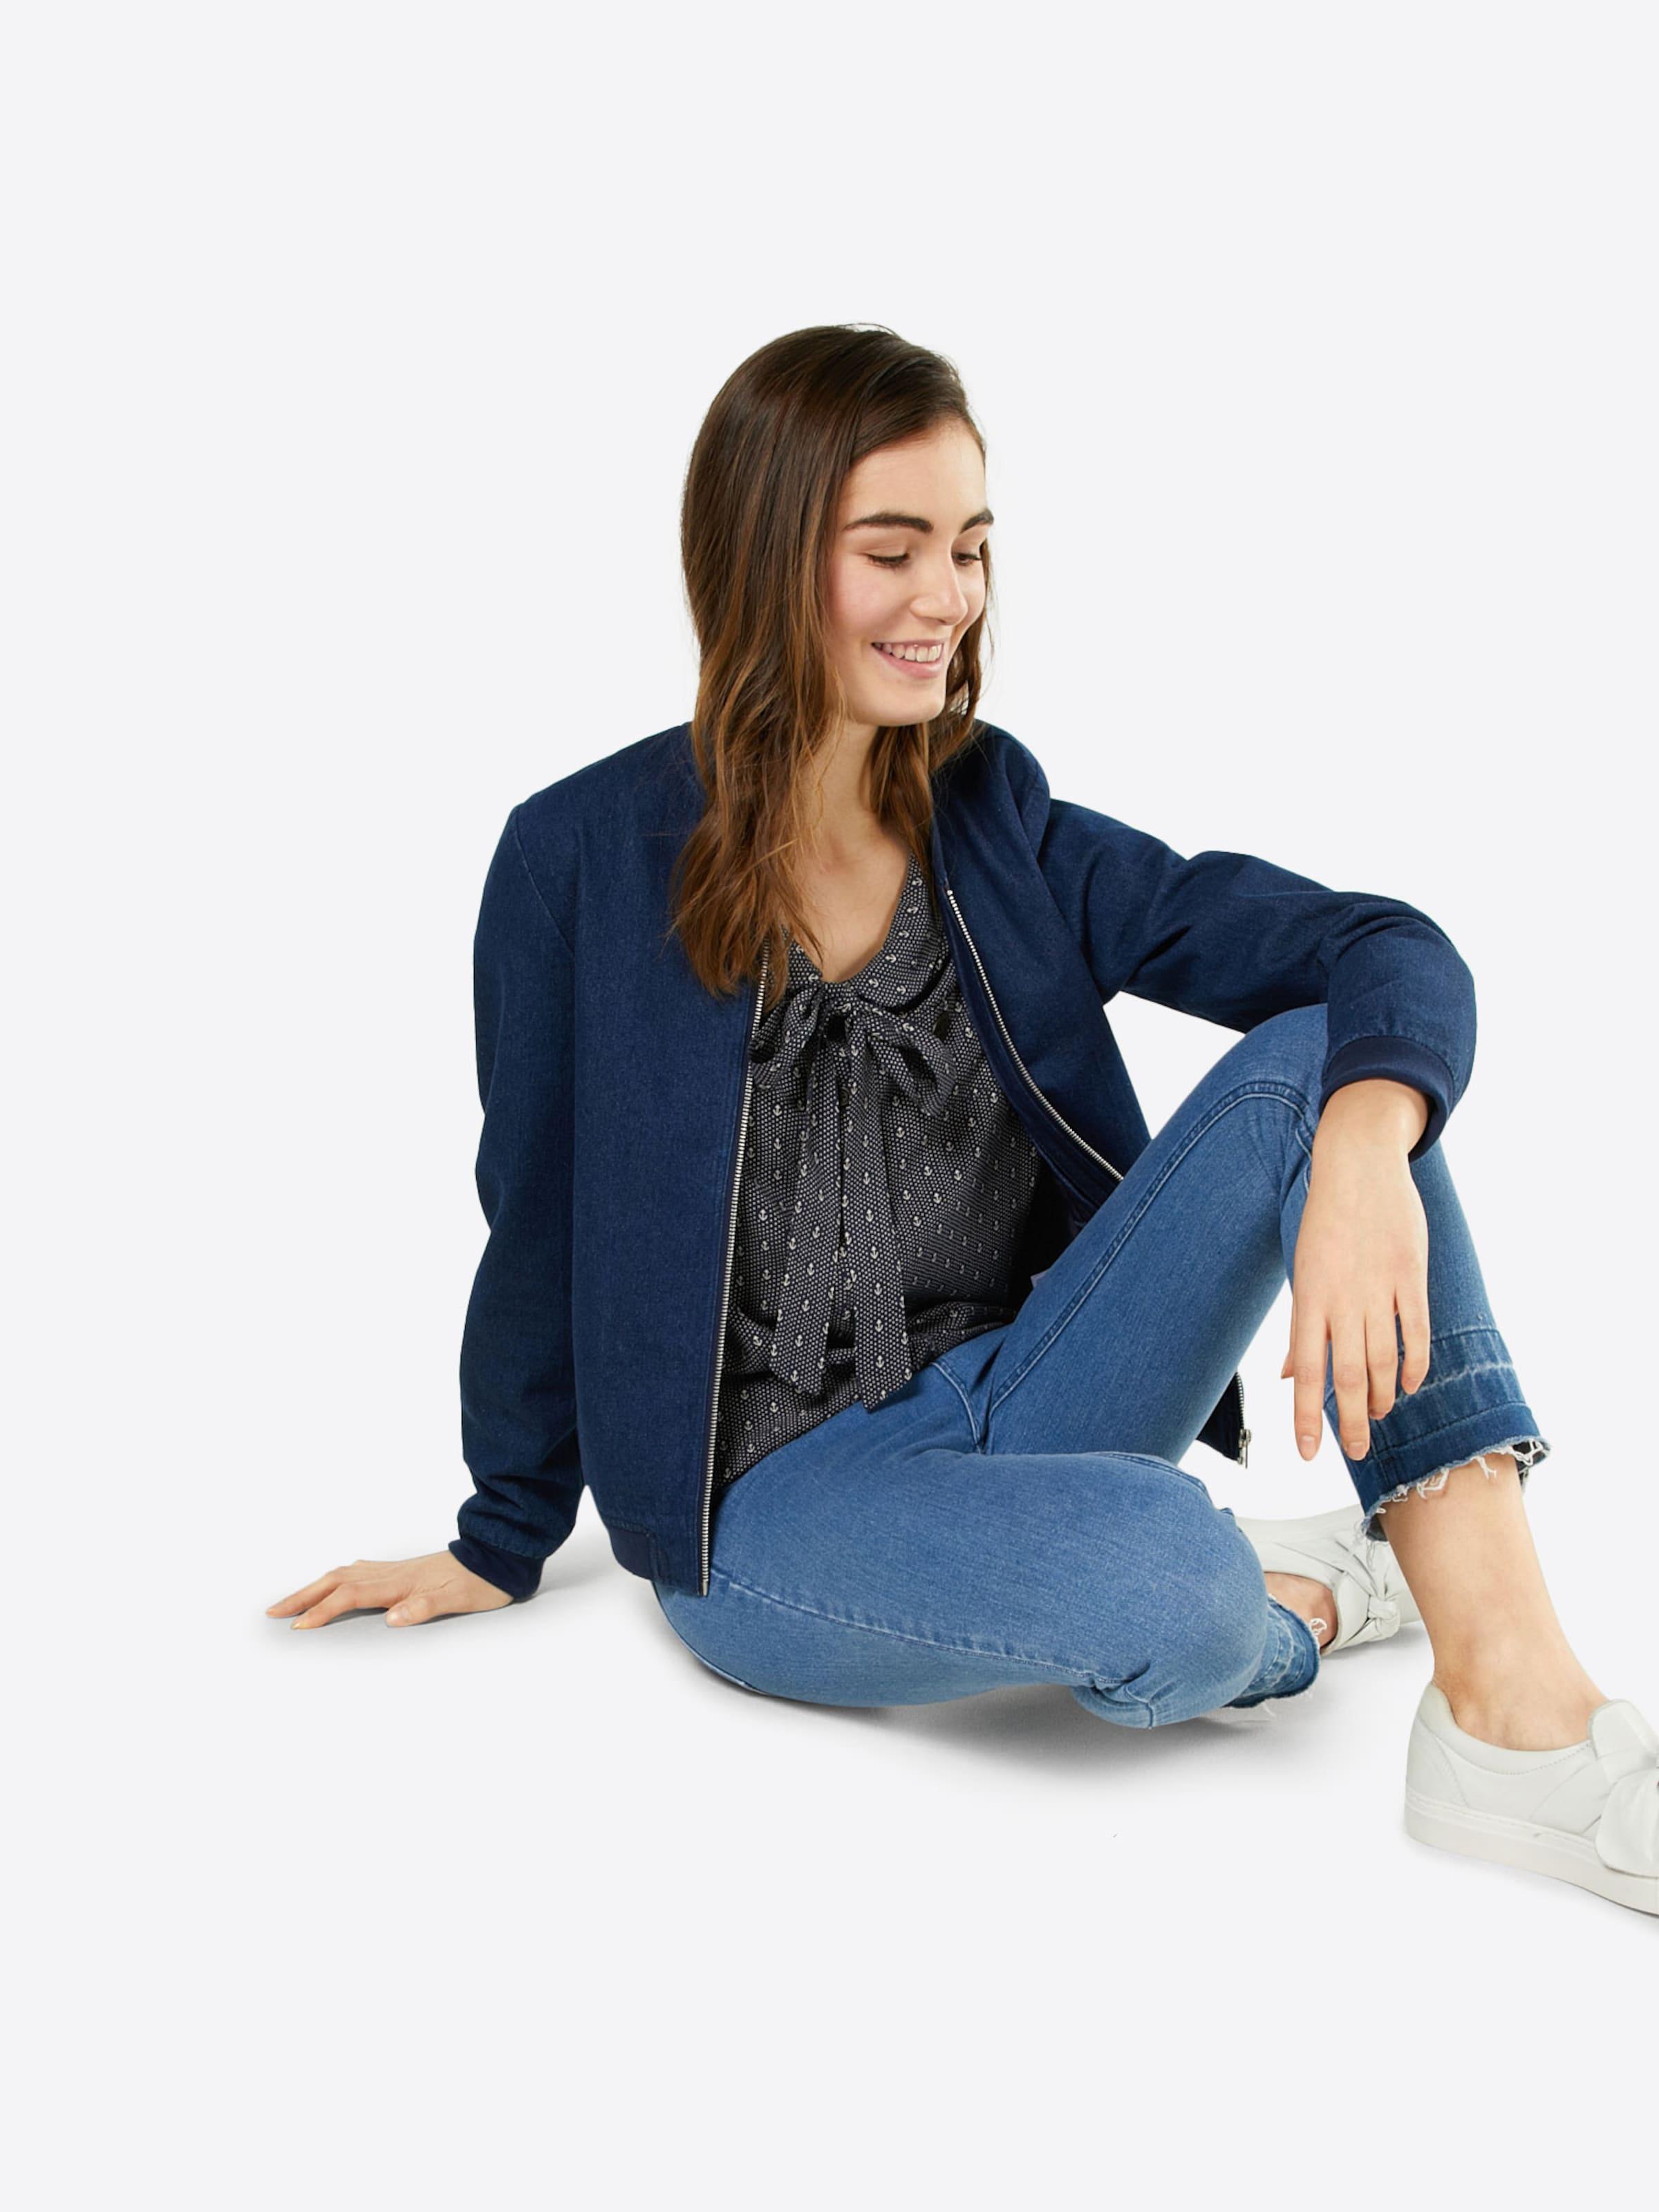 Bleu Naketano 'rumvögelchen' En FoncéBlanc shirt T L54jAR